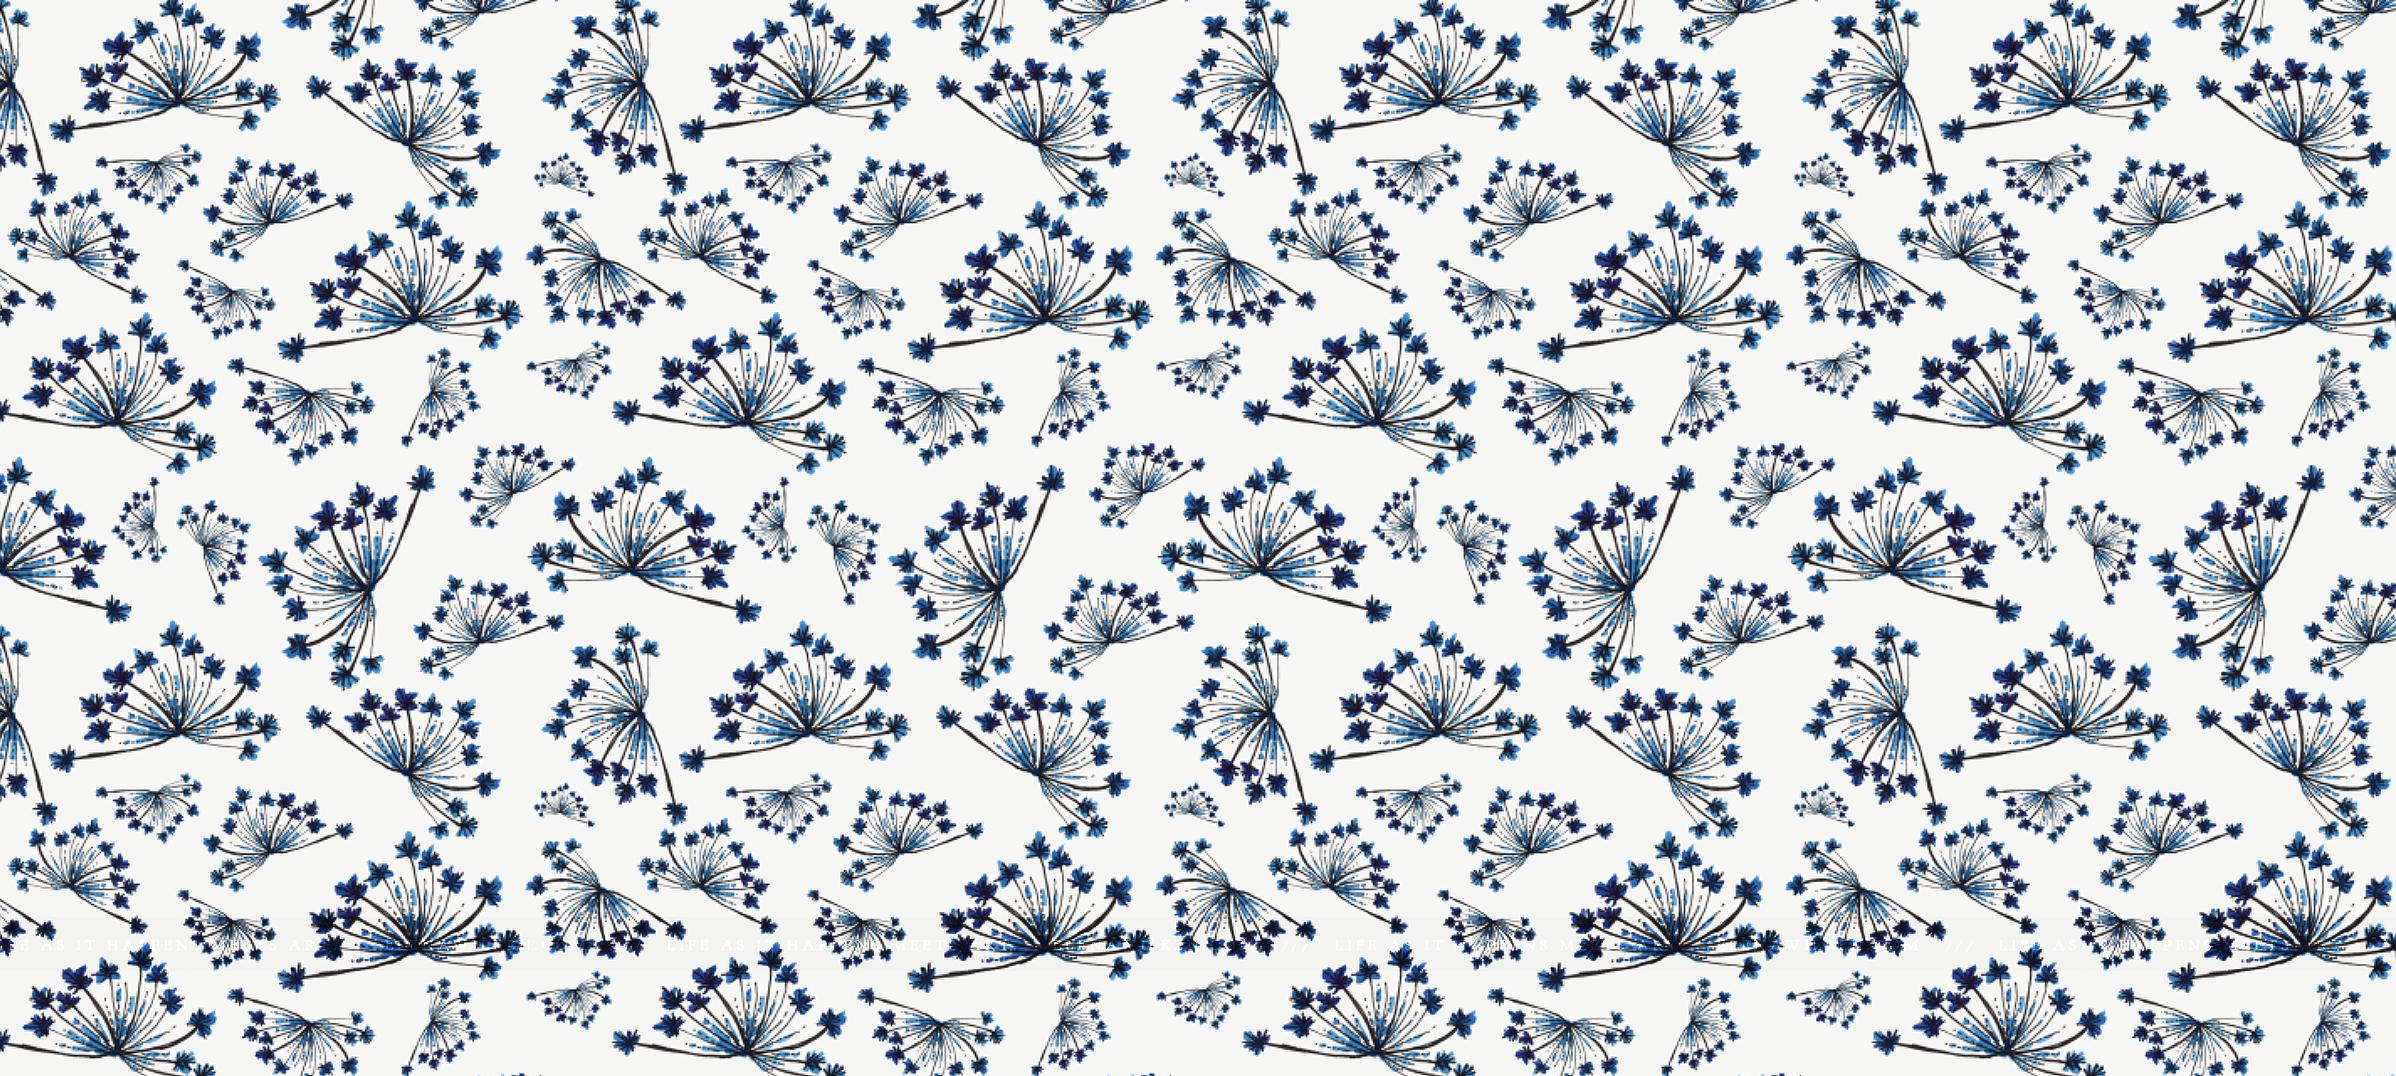 elena-wilken-whimsical-watercolor-fields-surface-pattern-design2.png